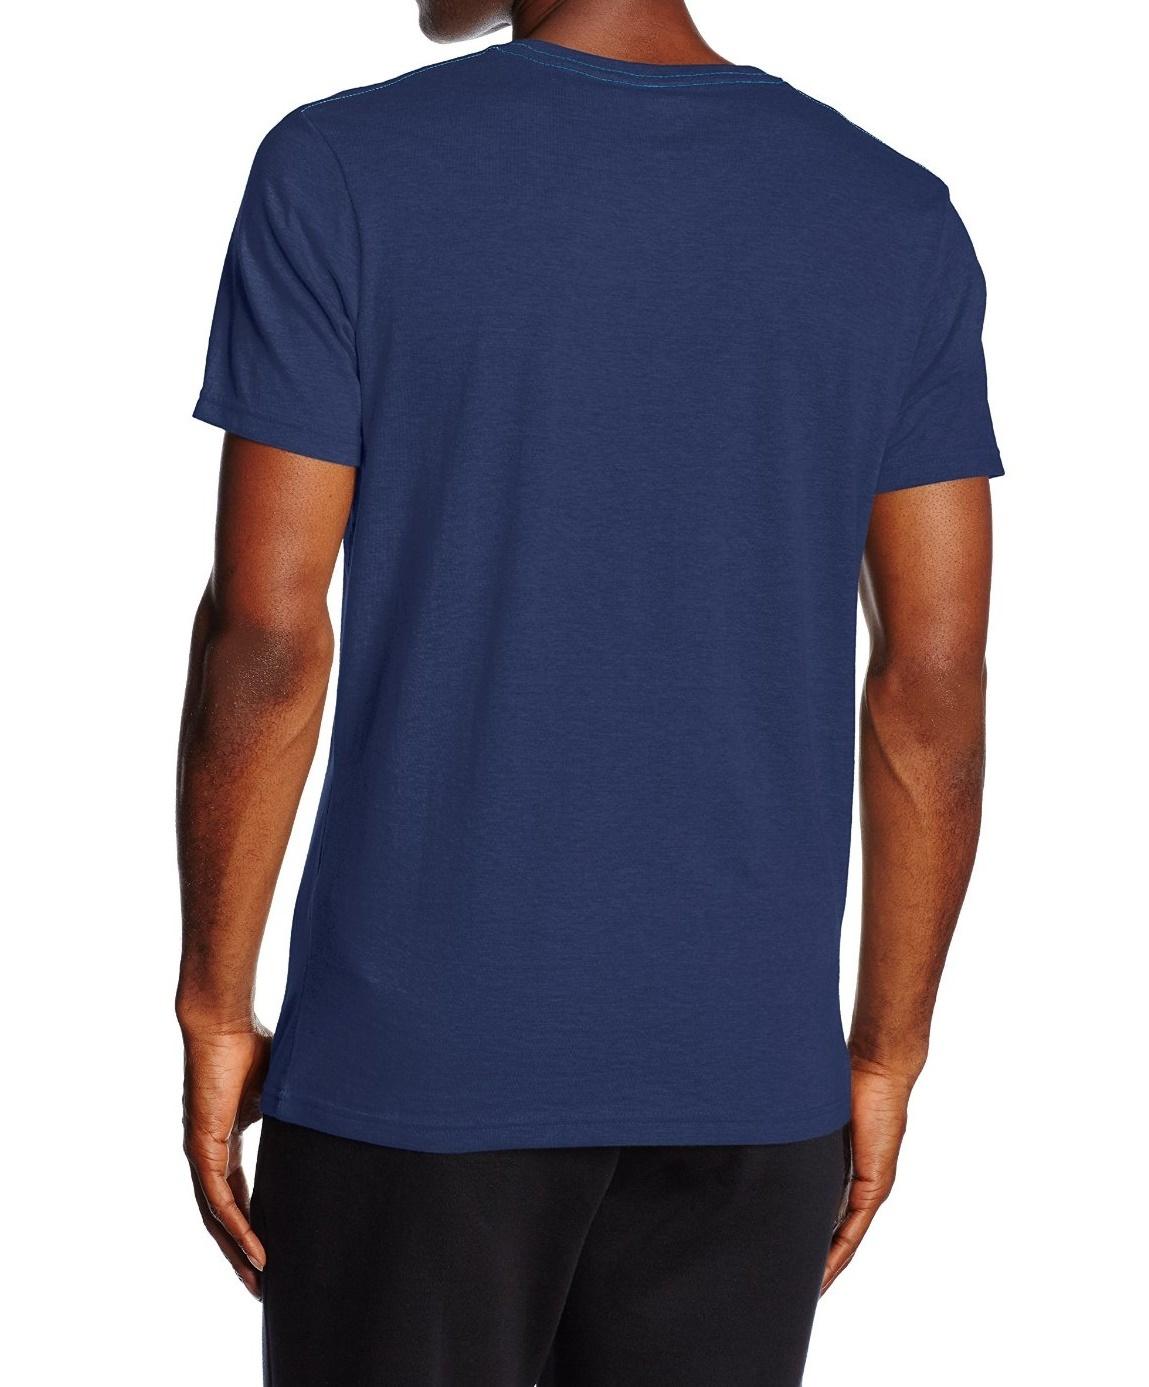 Мужская футболка Asics Graphic SS Top (125074 8052)